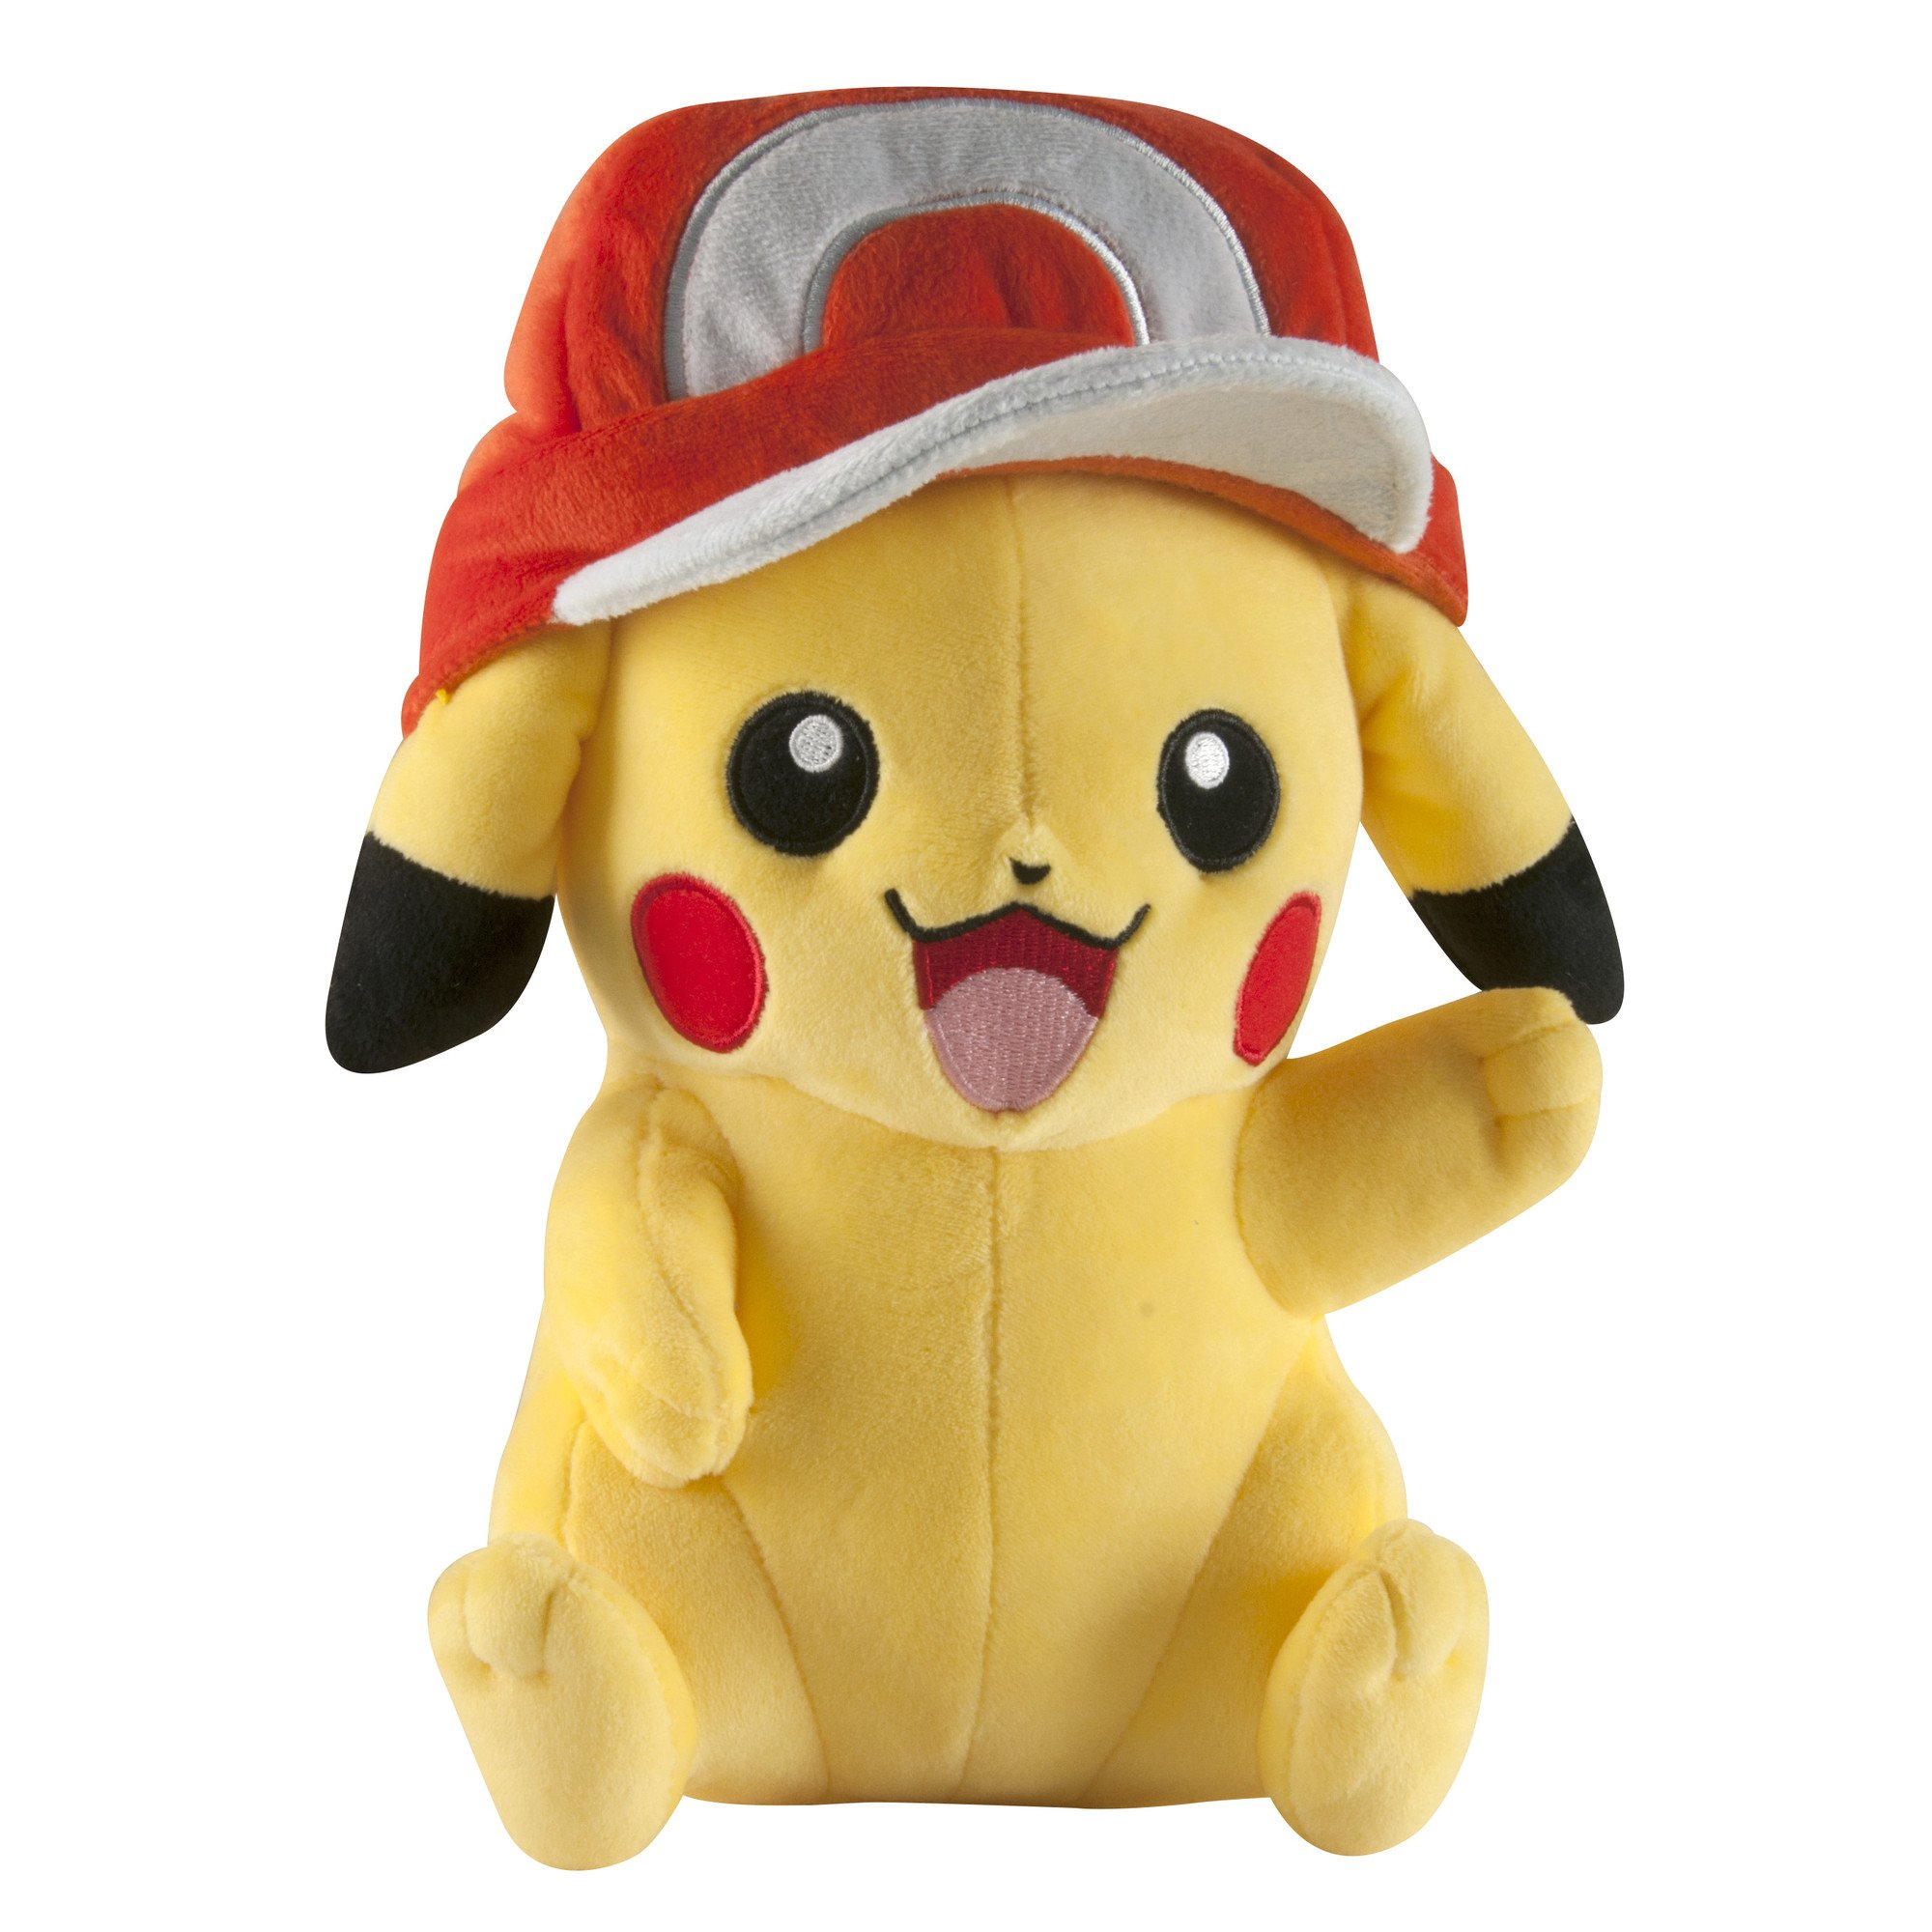 TOMY Pokémon Large Pikachu with Ash's Hat Plush by TOMY